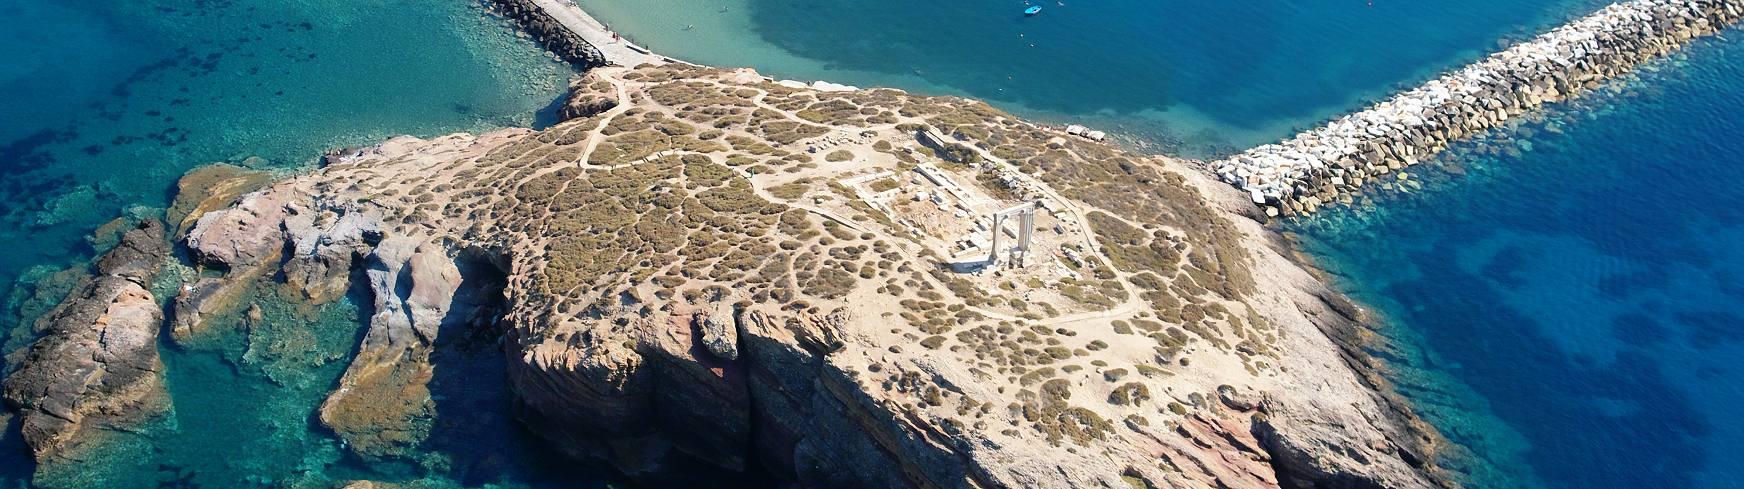 Naxos Island Greece travel touring naxos, naxos hotels ...